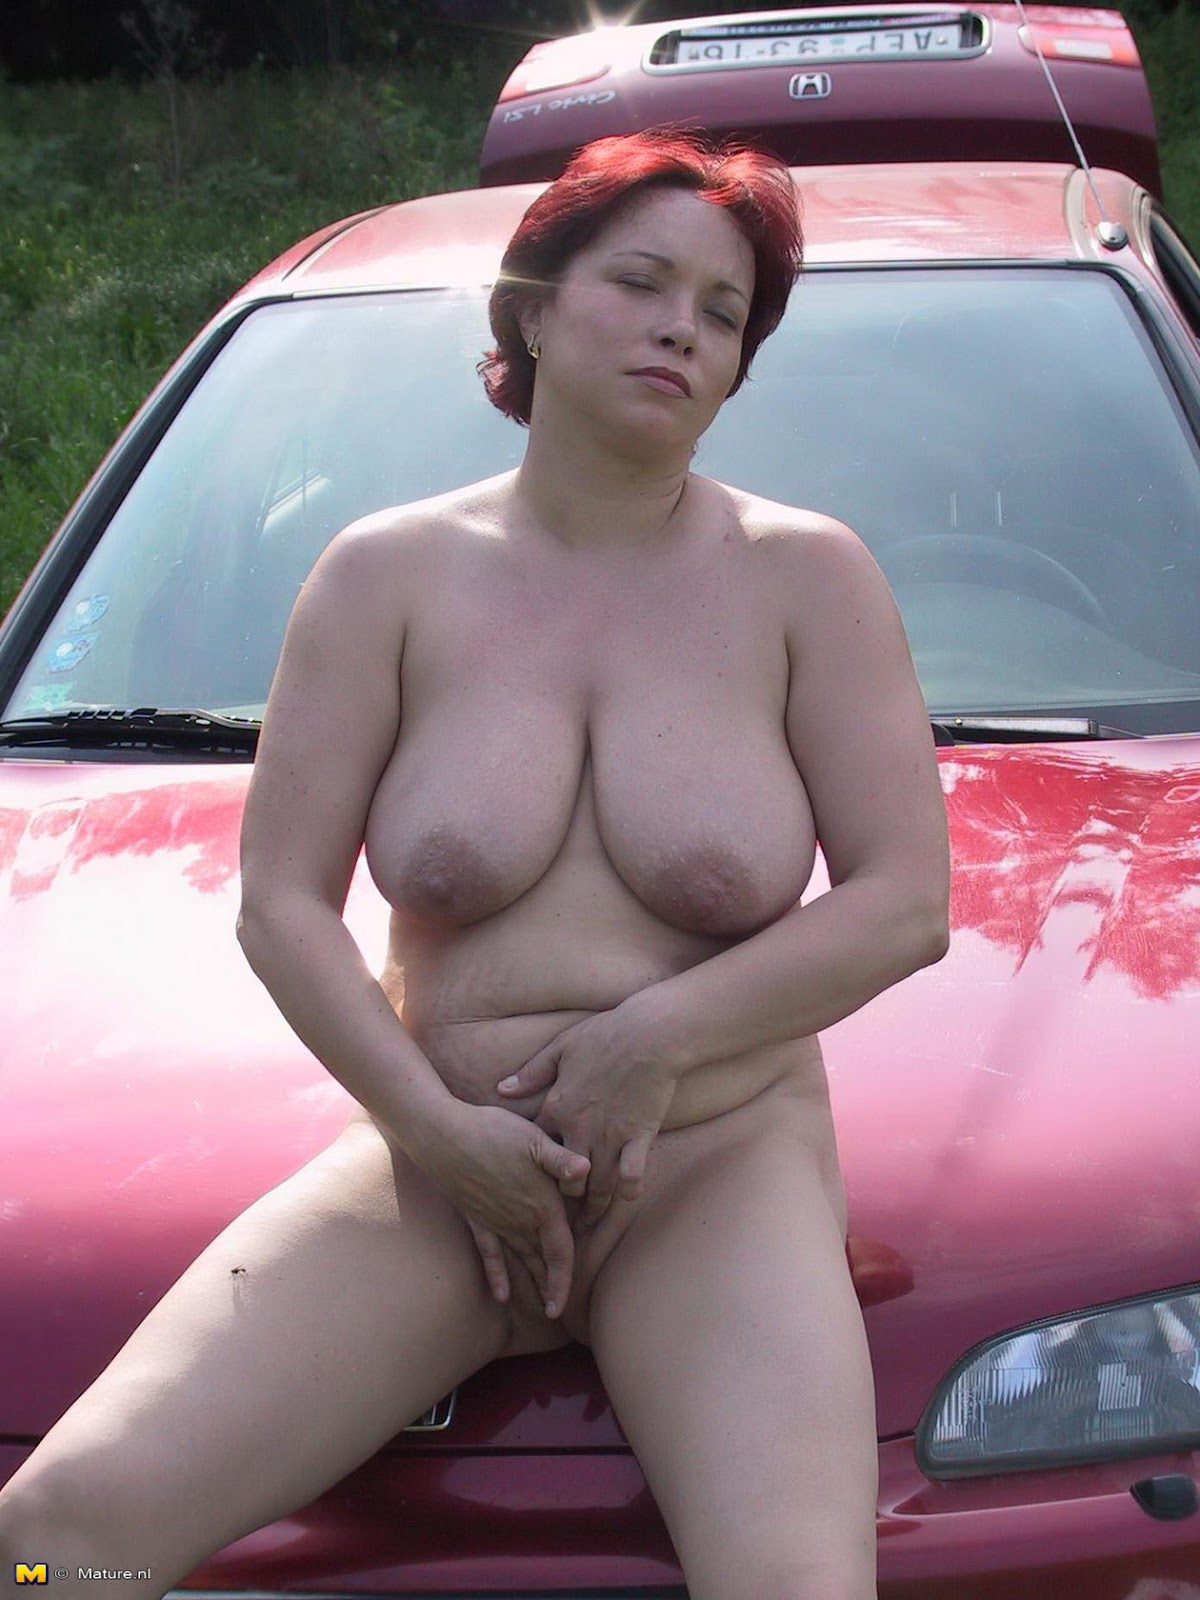 66 year old slut linda - 2 4